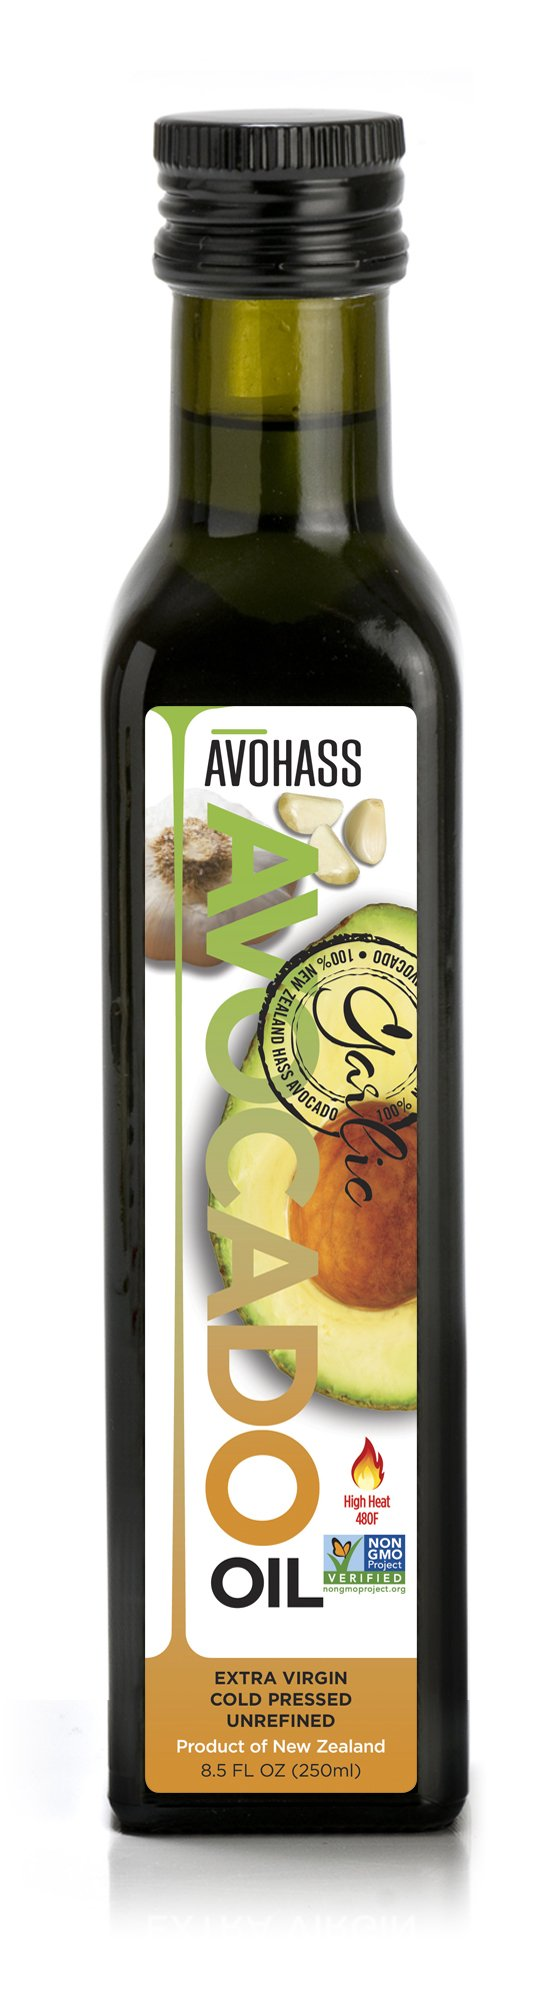 Avohass New Zealand Garlic Extra Virgin Avocado Oil 8.5 fl oz